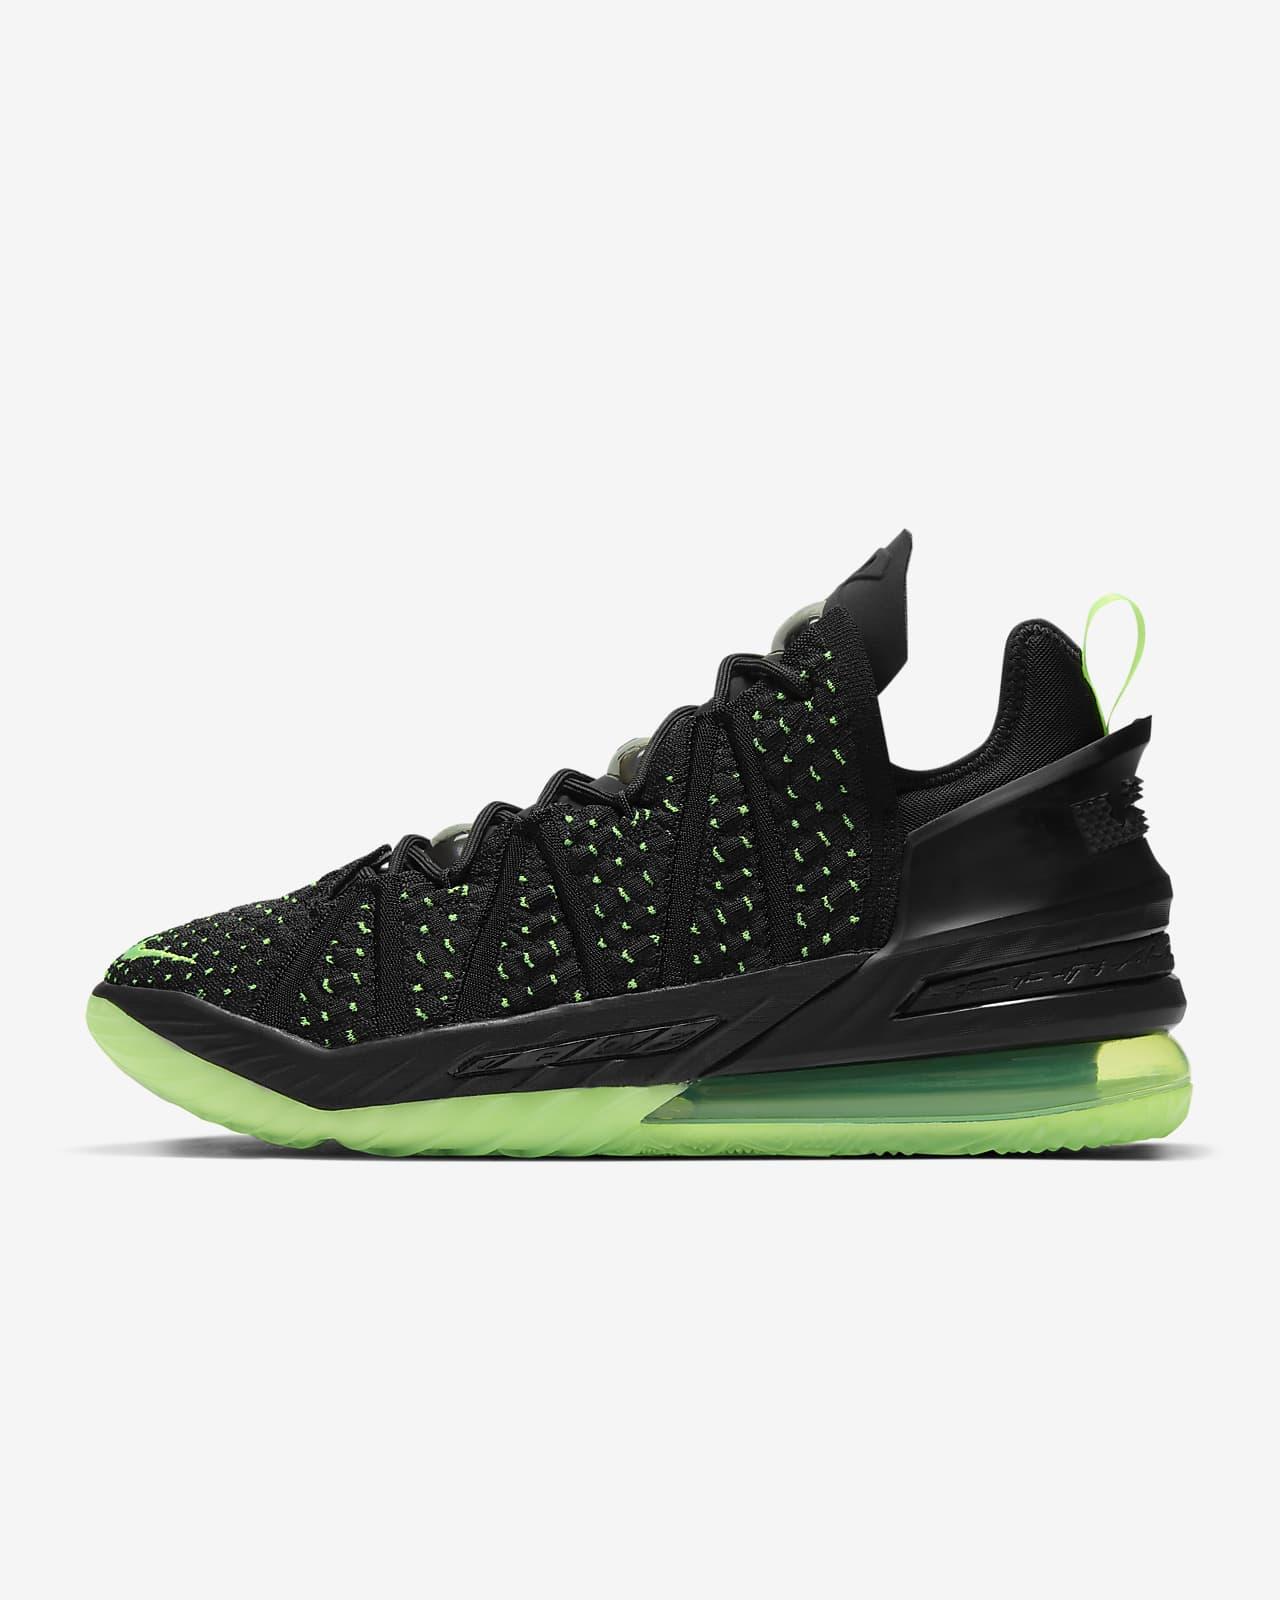 LeBron 18 'Black/Electric Green' Basketball Shoe